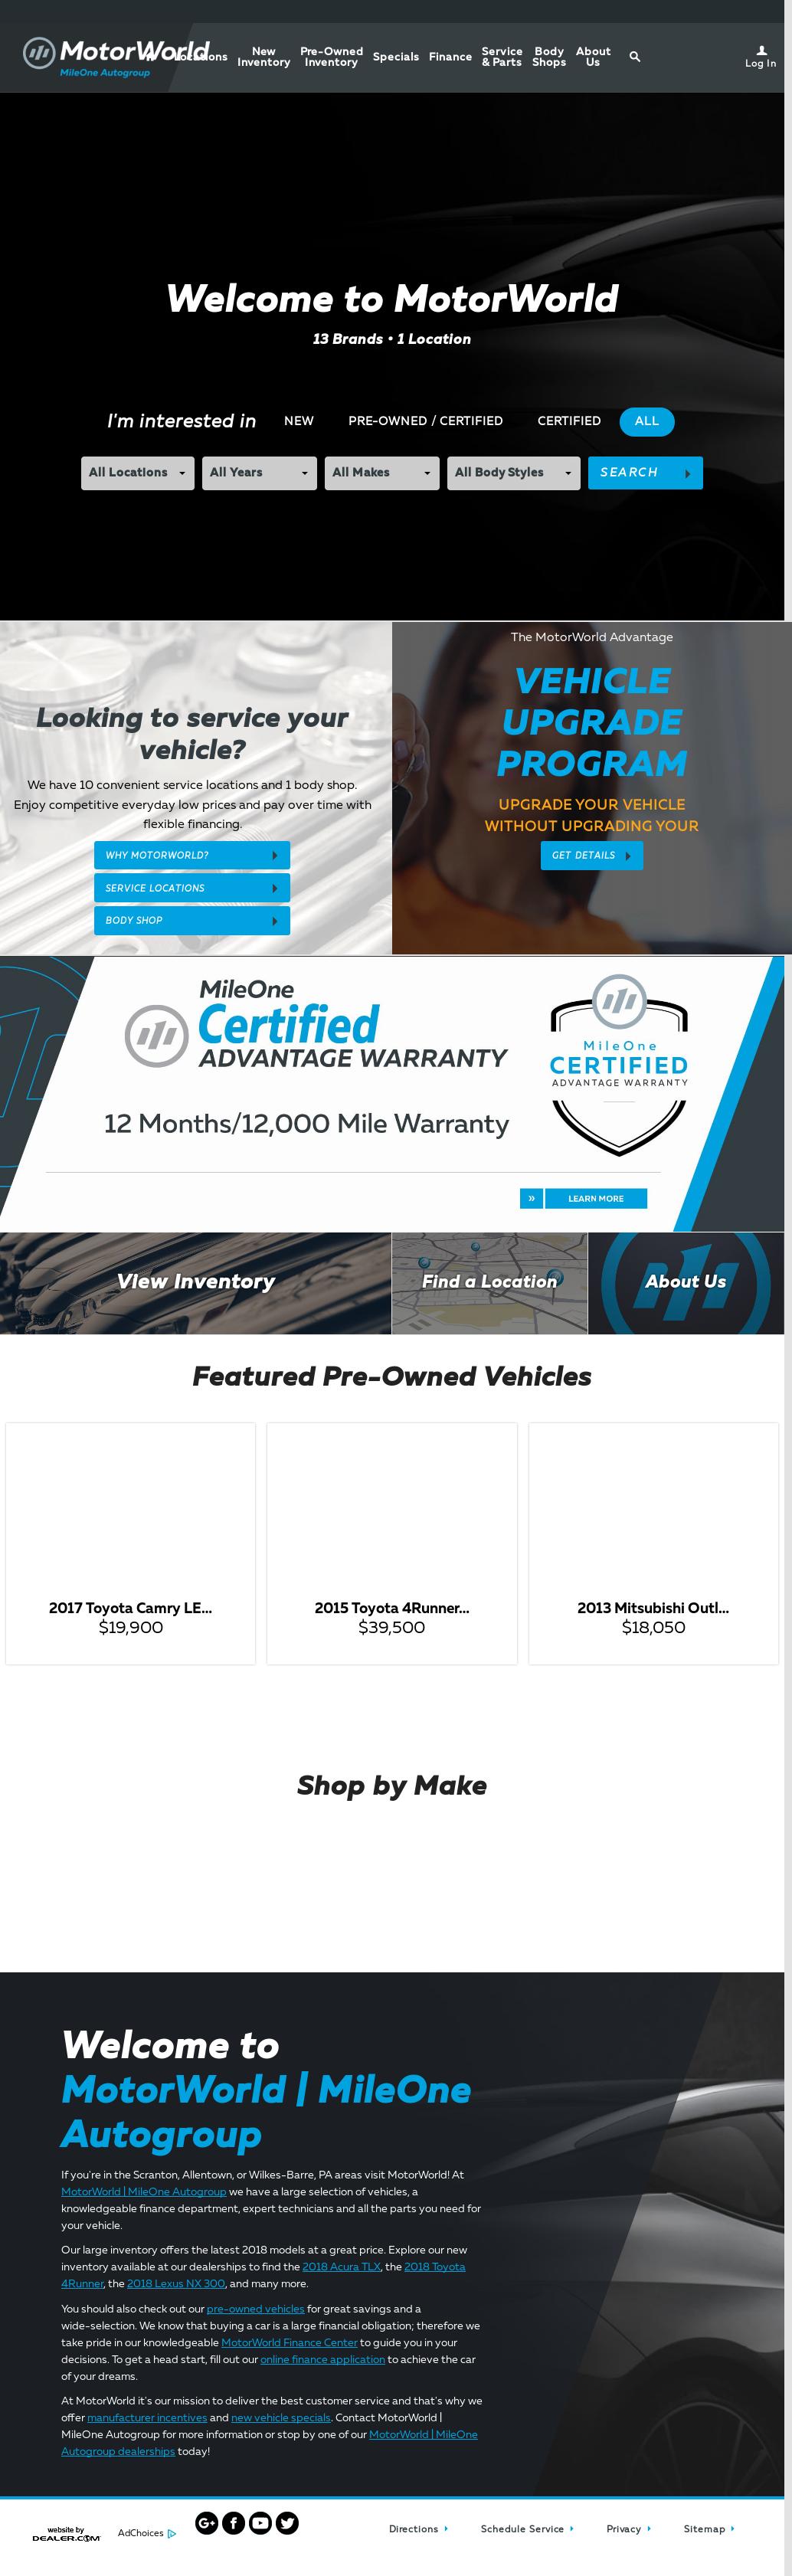 MotorWorld petitors Revenue and Employees Owler pany Profile